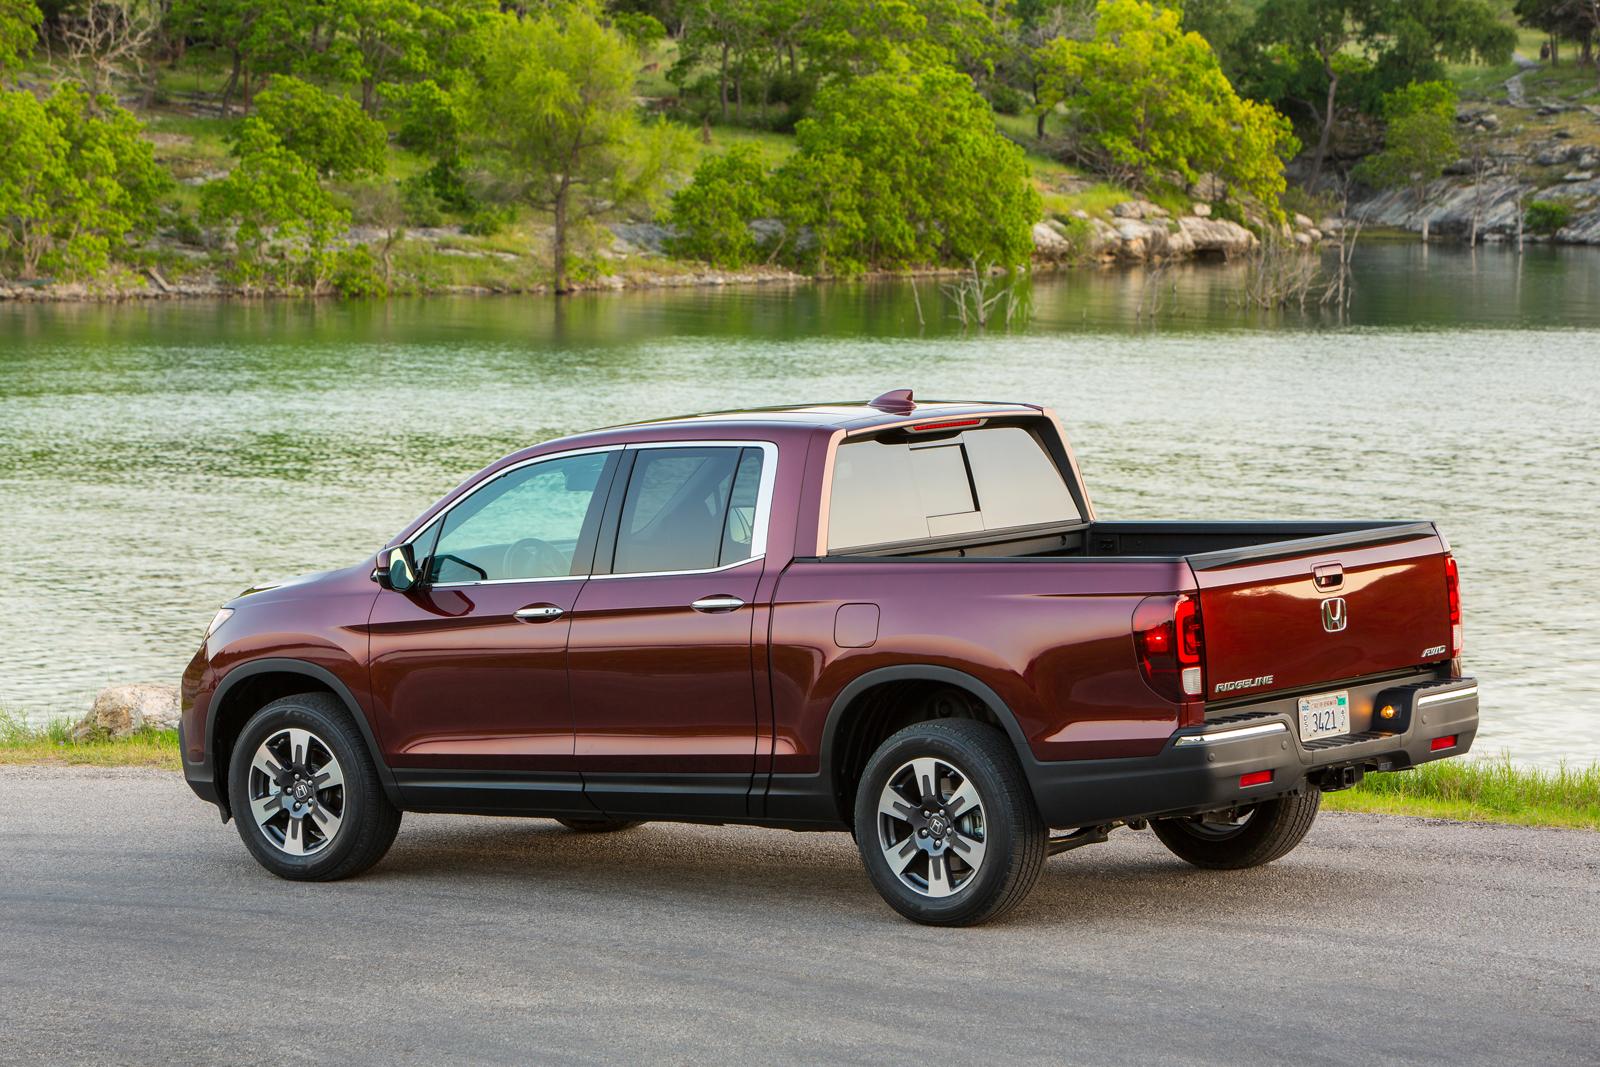 Honda Recalls 650,000 Odyssey Minivans & Ridgeline Pickups